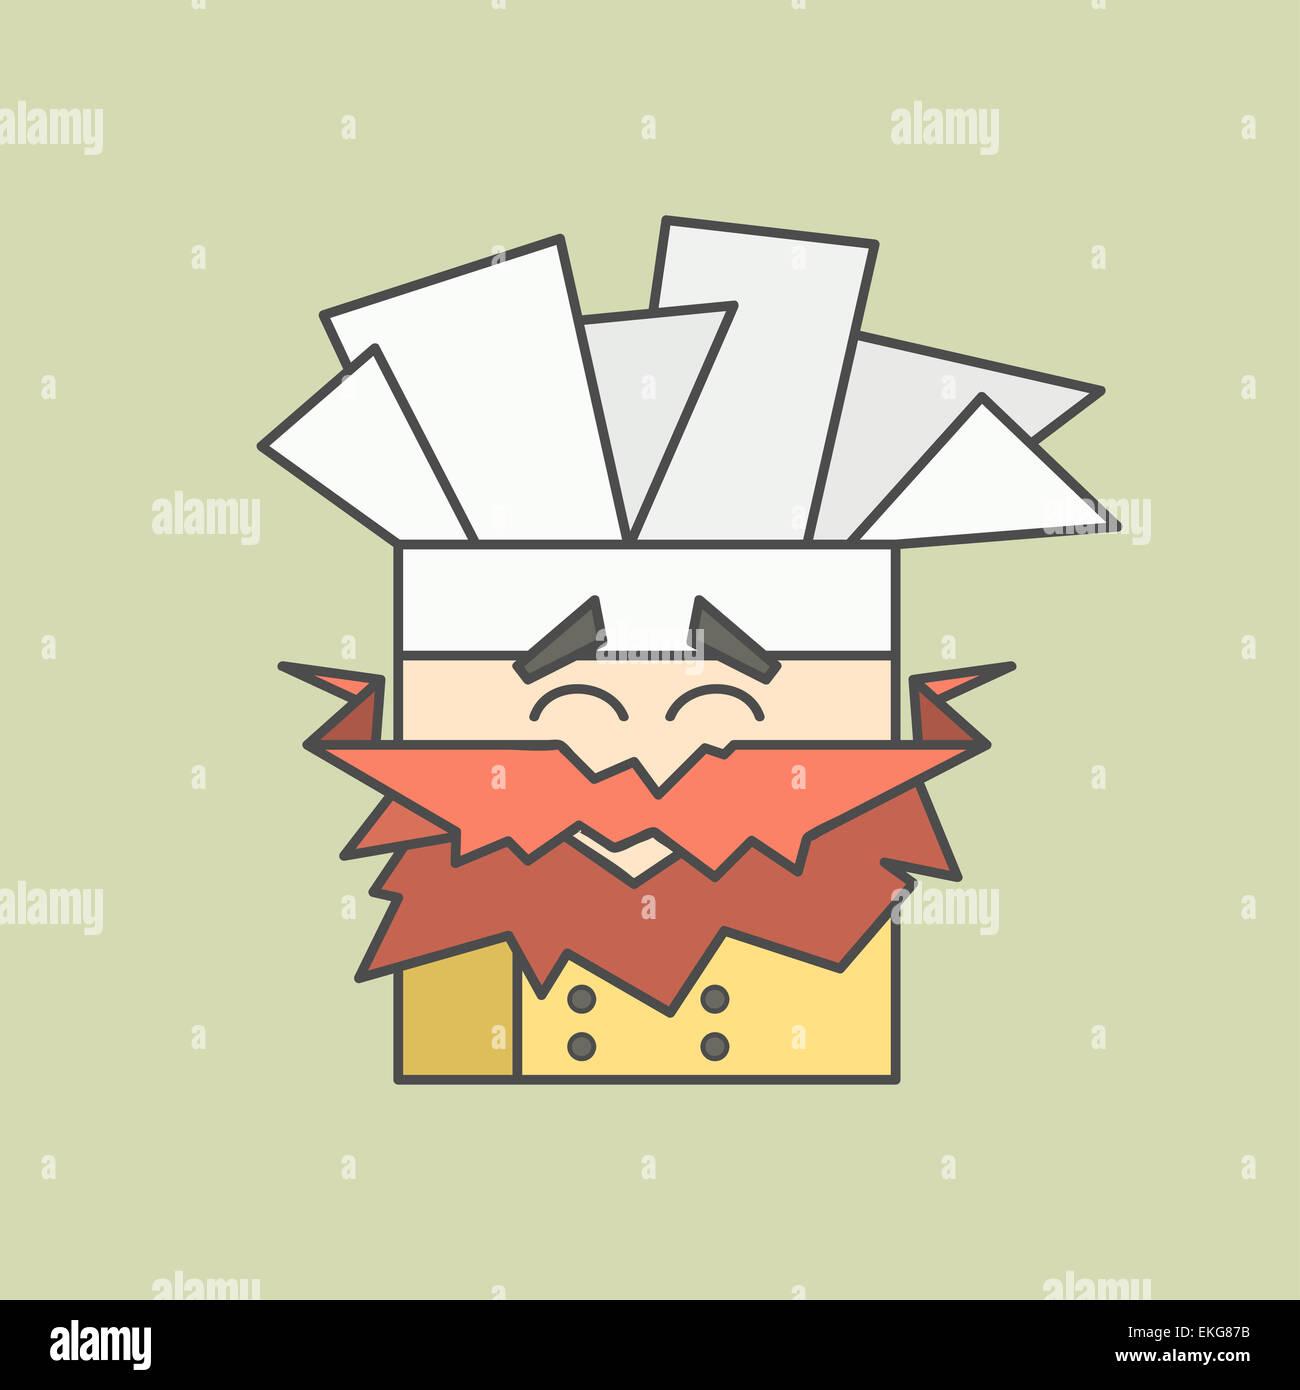 Cartoon mustache face stockfotos cartoon mustache face for Koch mit bart